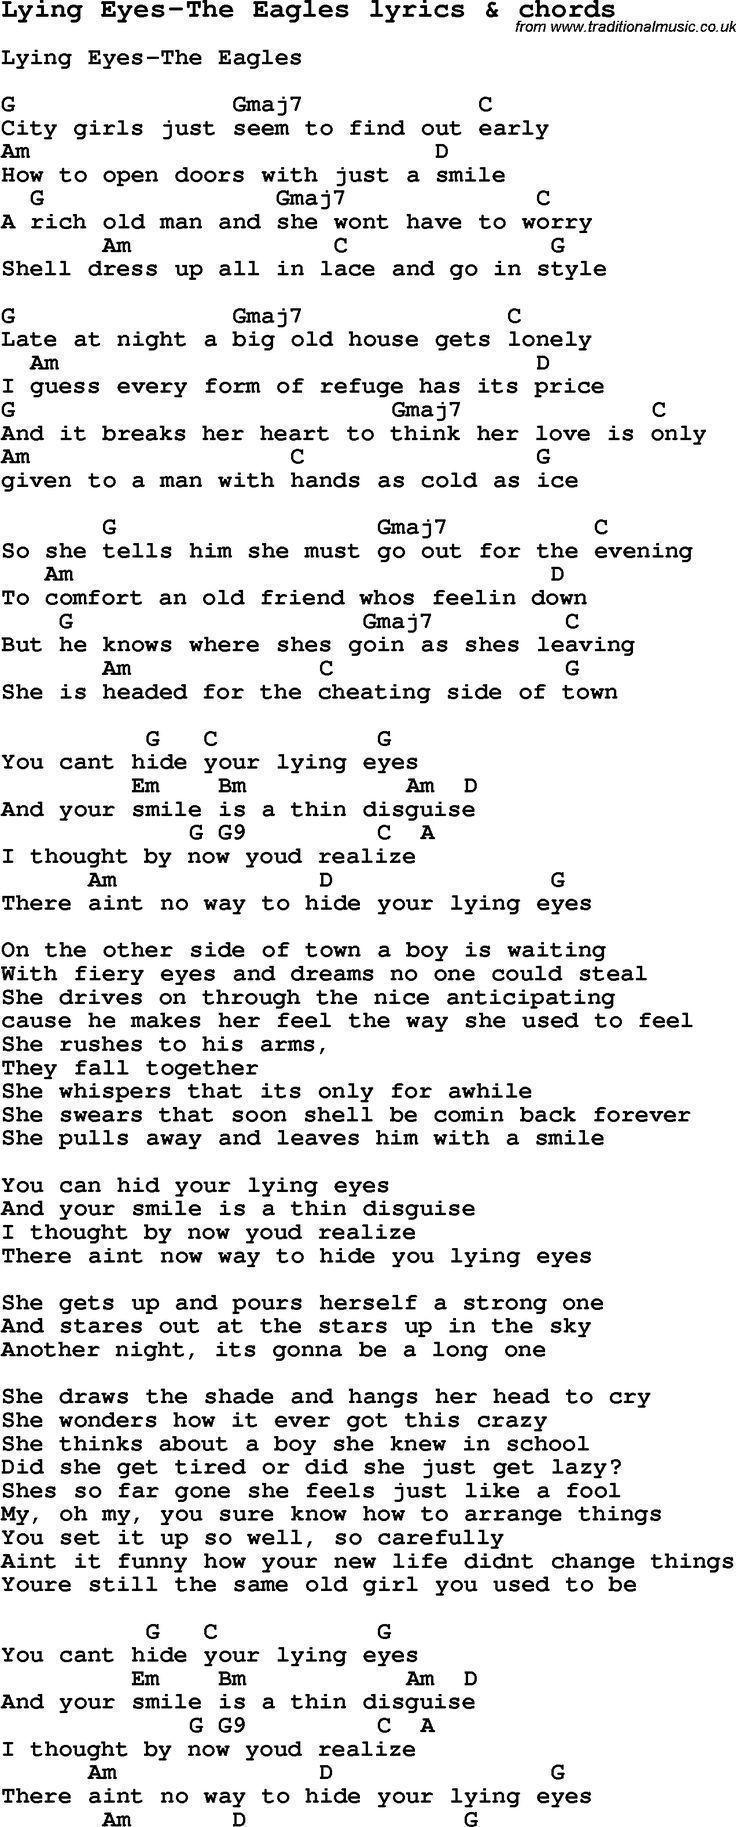 Love Song Lyrics for Lying EyesThe Eagles with chords